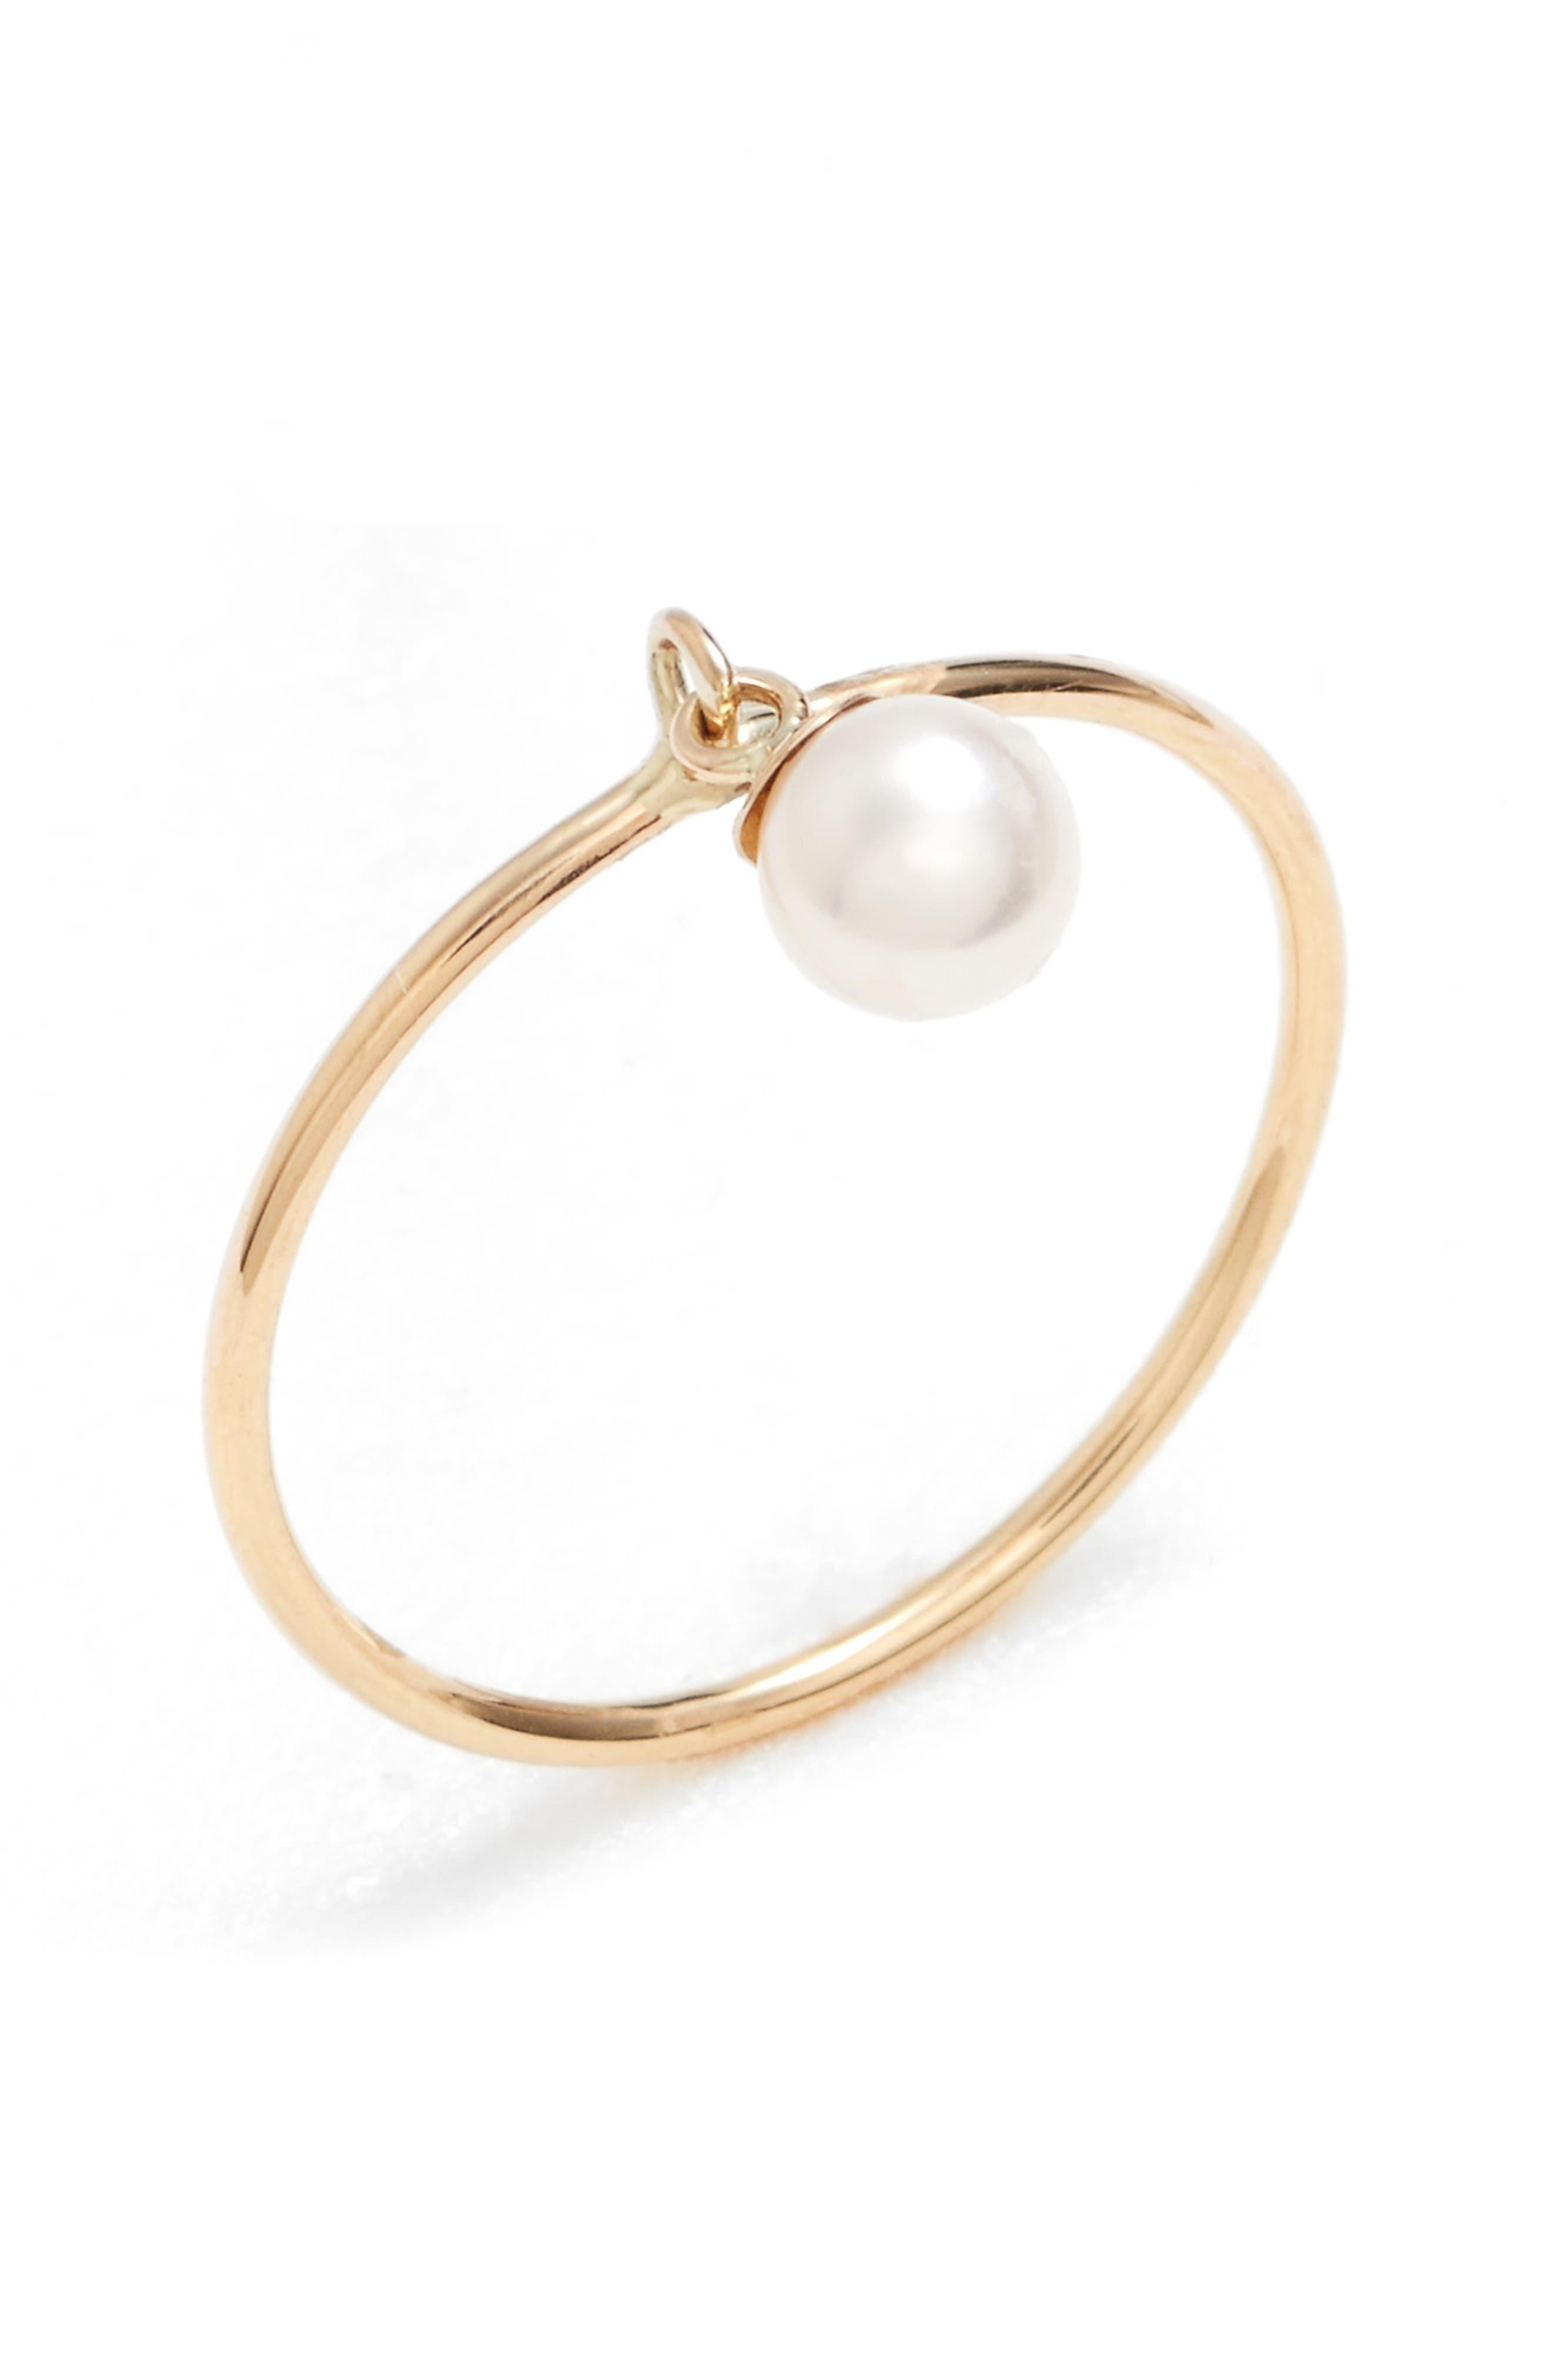 Poppy Finch Dangling Pearl Charm Ring